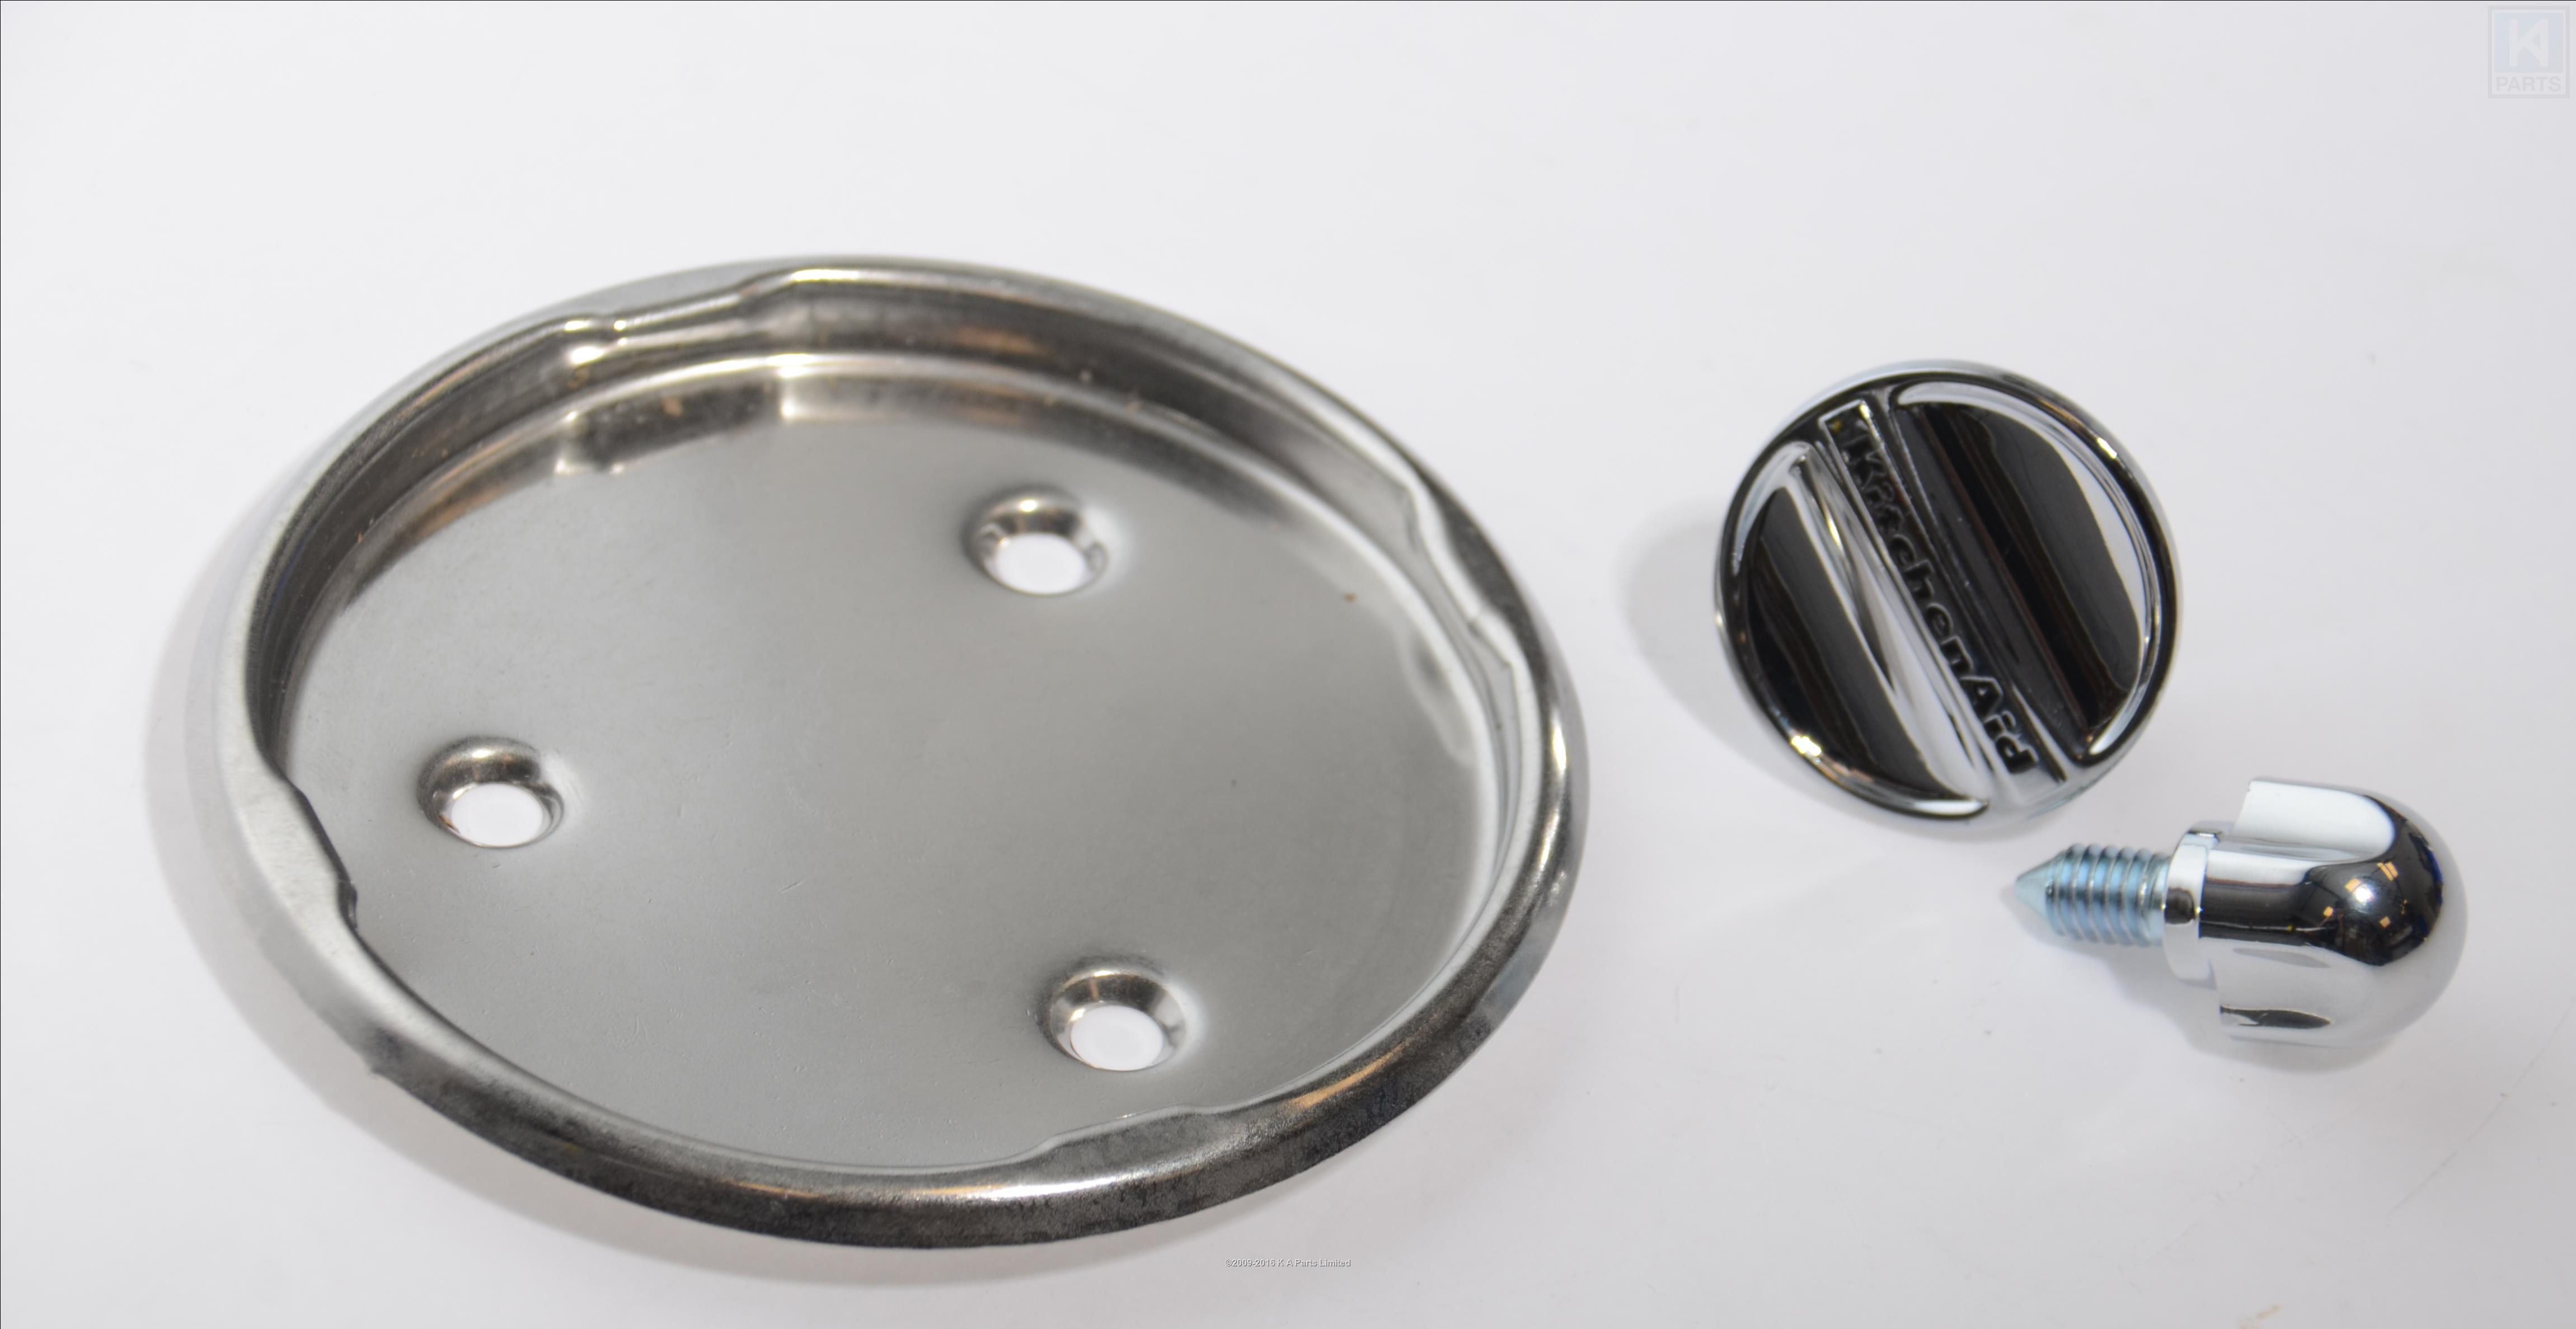 kitchenaid stand mixer chrome set artisan 4 5 qt 5 qt ebay. Black Bedroom Furniture Sets. Home Design Ideas